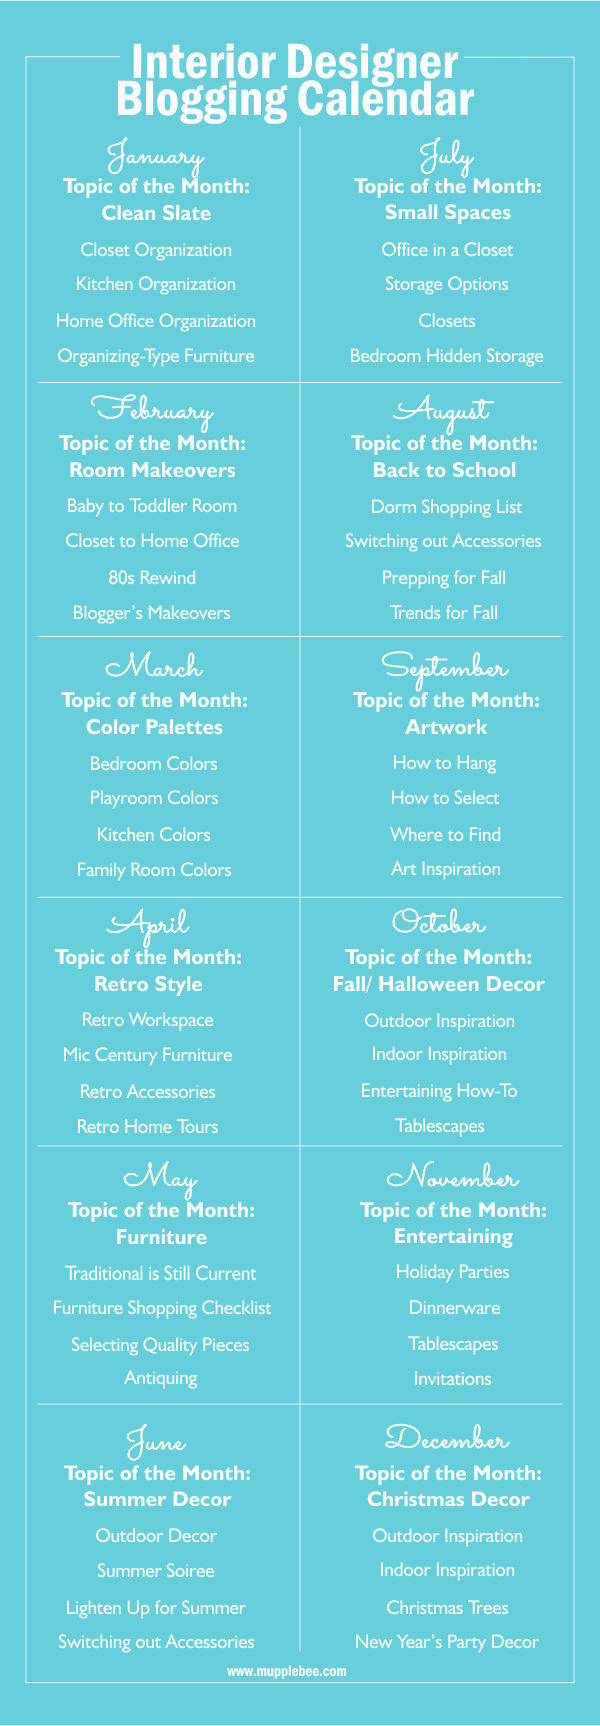 Interior Design Editorial Blogging Calendar Interior Design Business Tips Interior Design